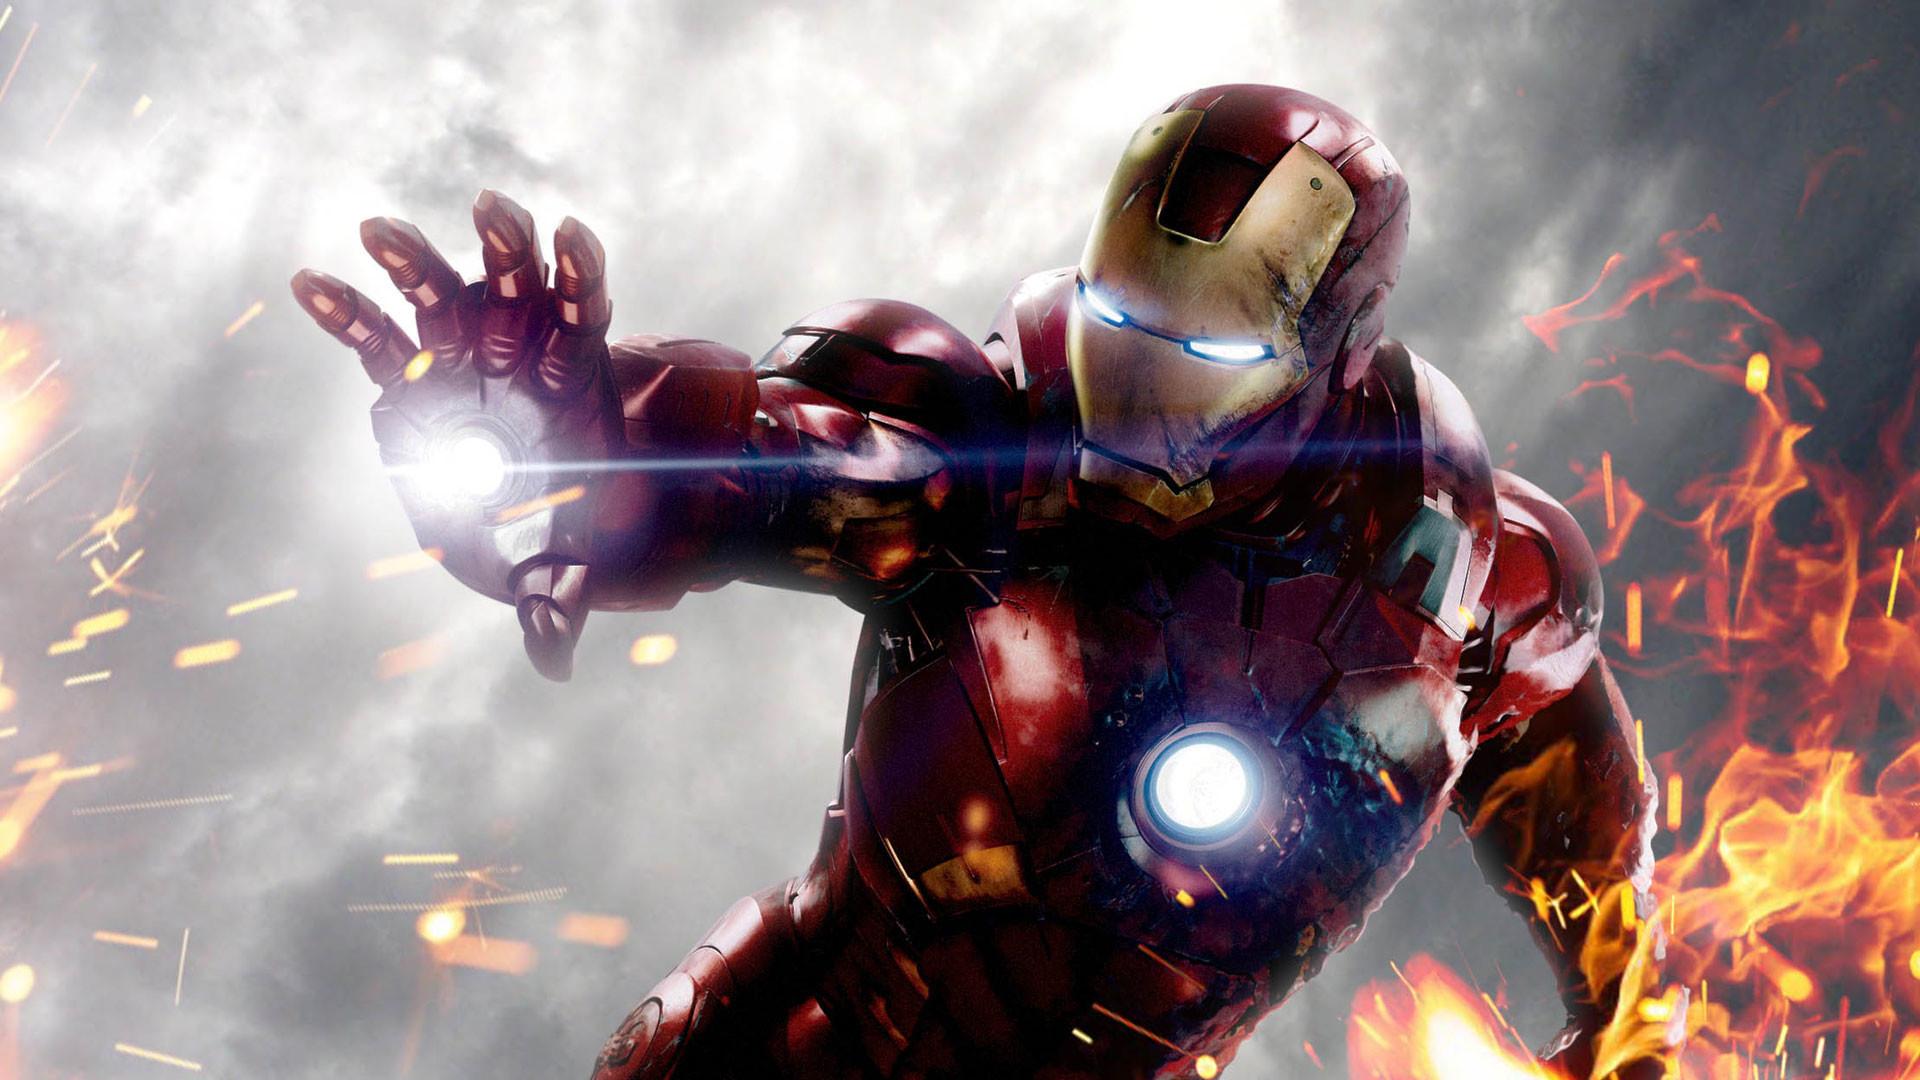 Iron man hd wallpapers 1080p 72 images for Sfondi iron man